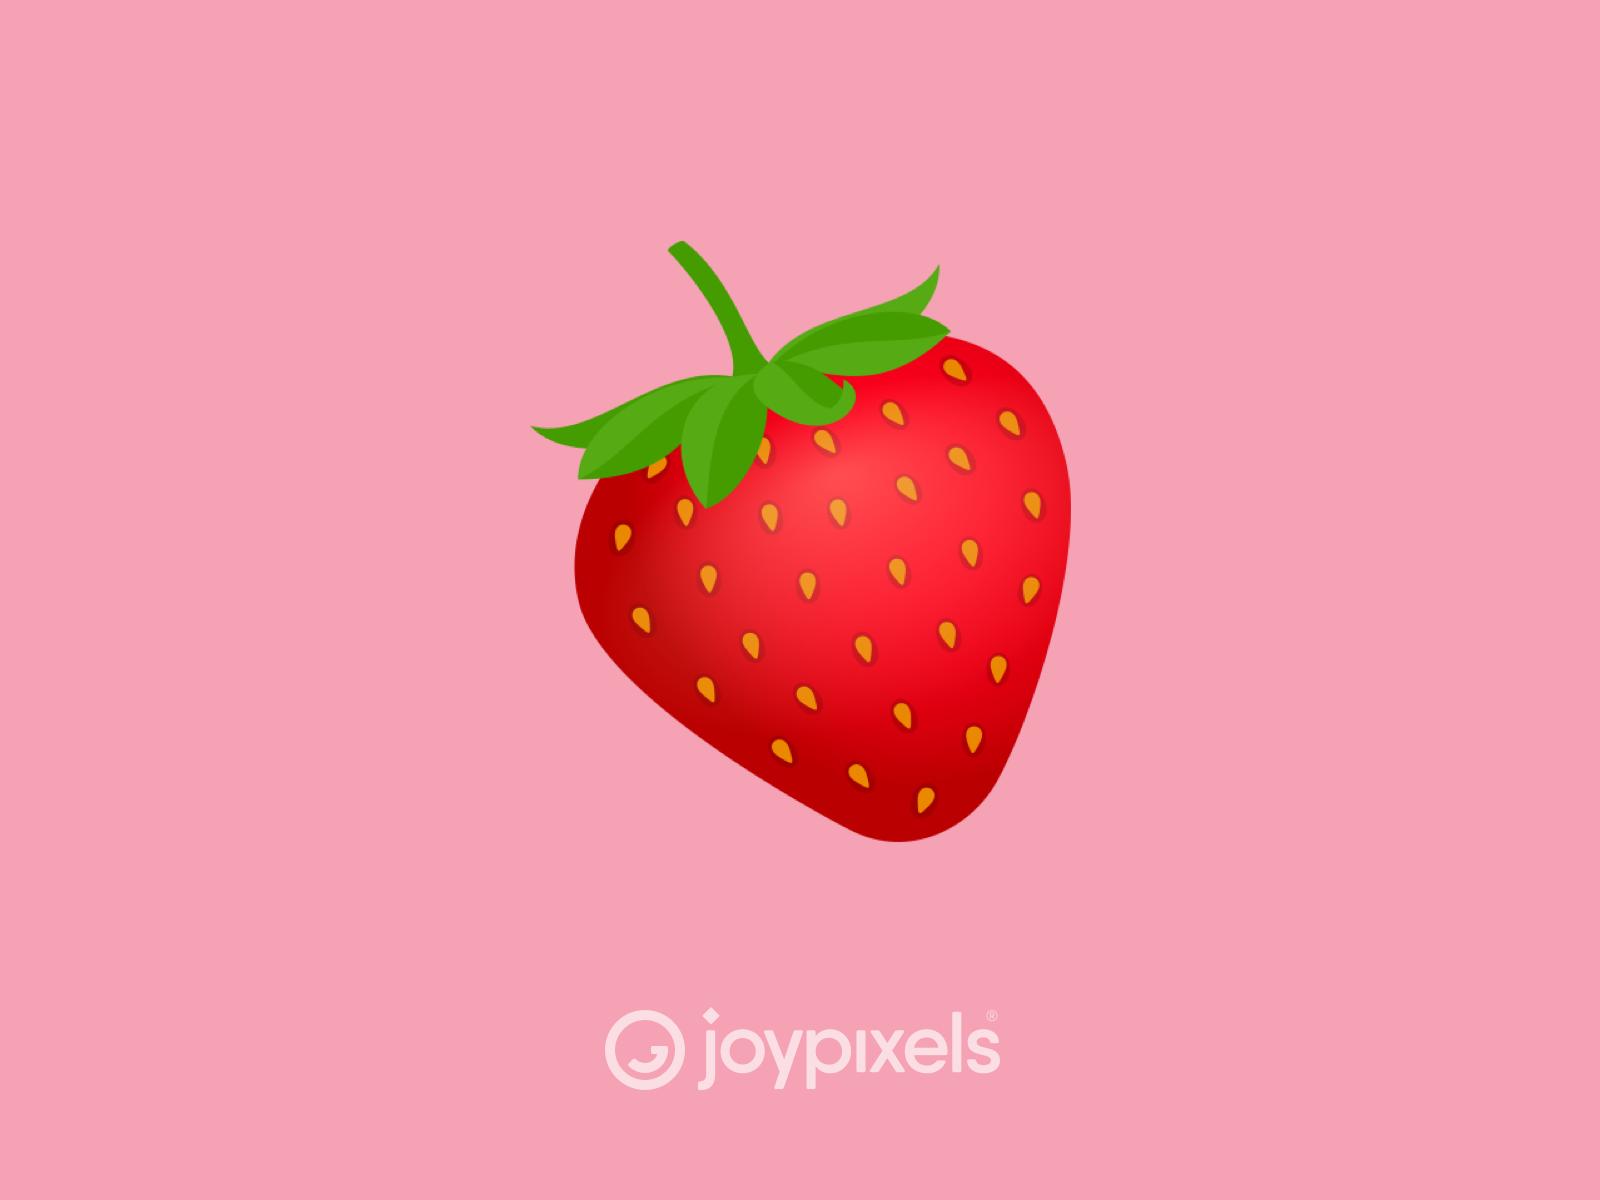 The Joypixels Strawberry Emoji Version 6 0 By Joypixels On Dribbble The strawberry emoji first appeared in 2010. the joypixels strawberry emoji